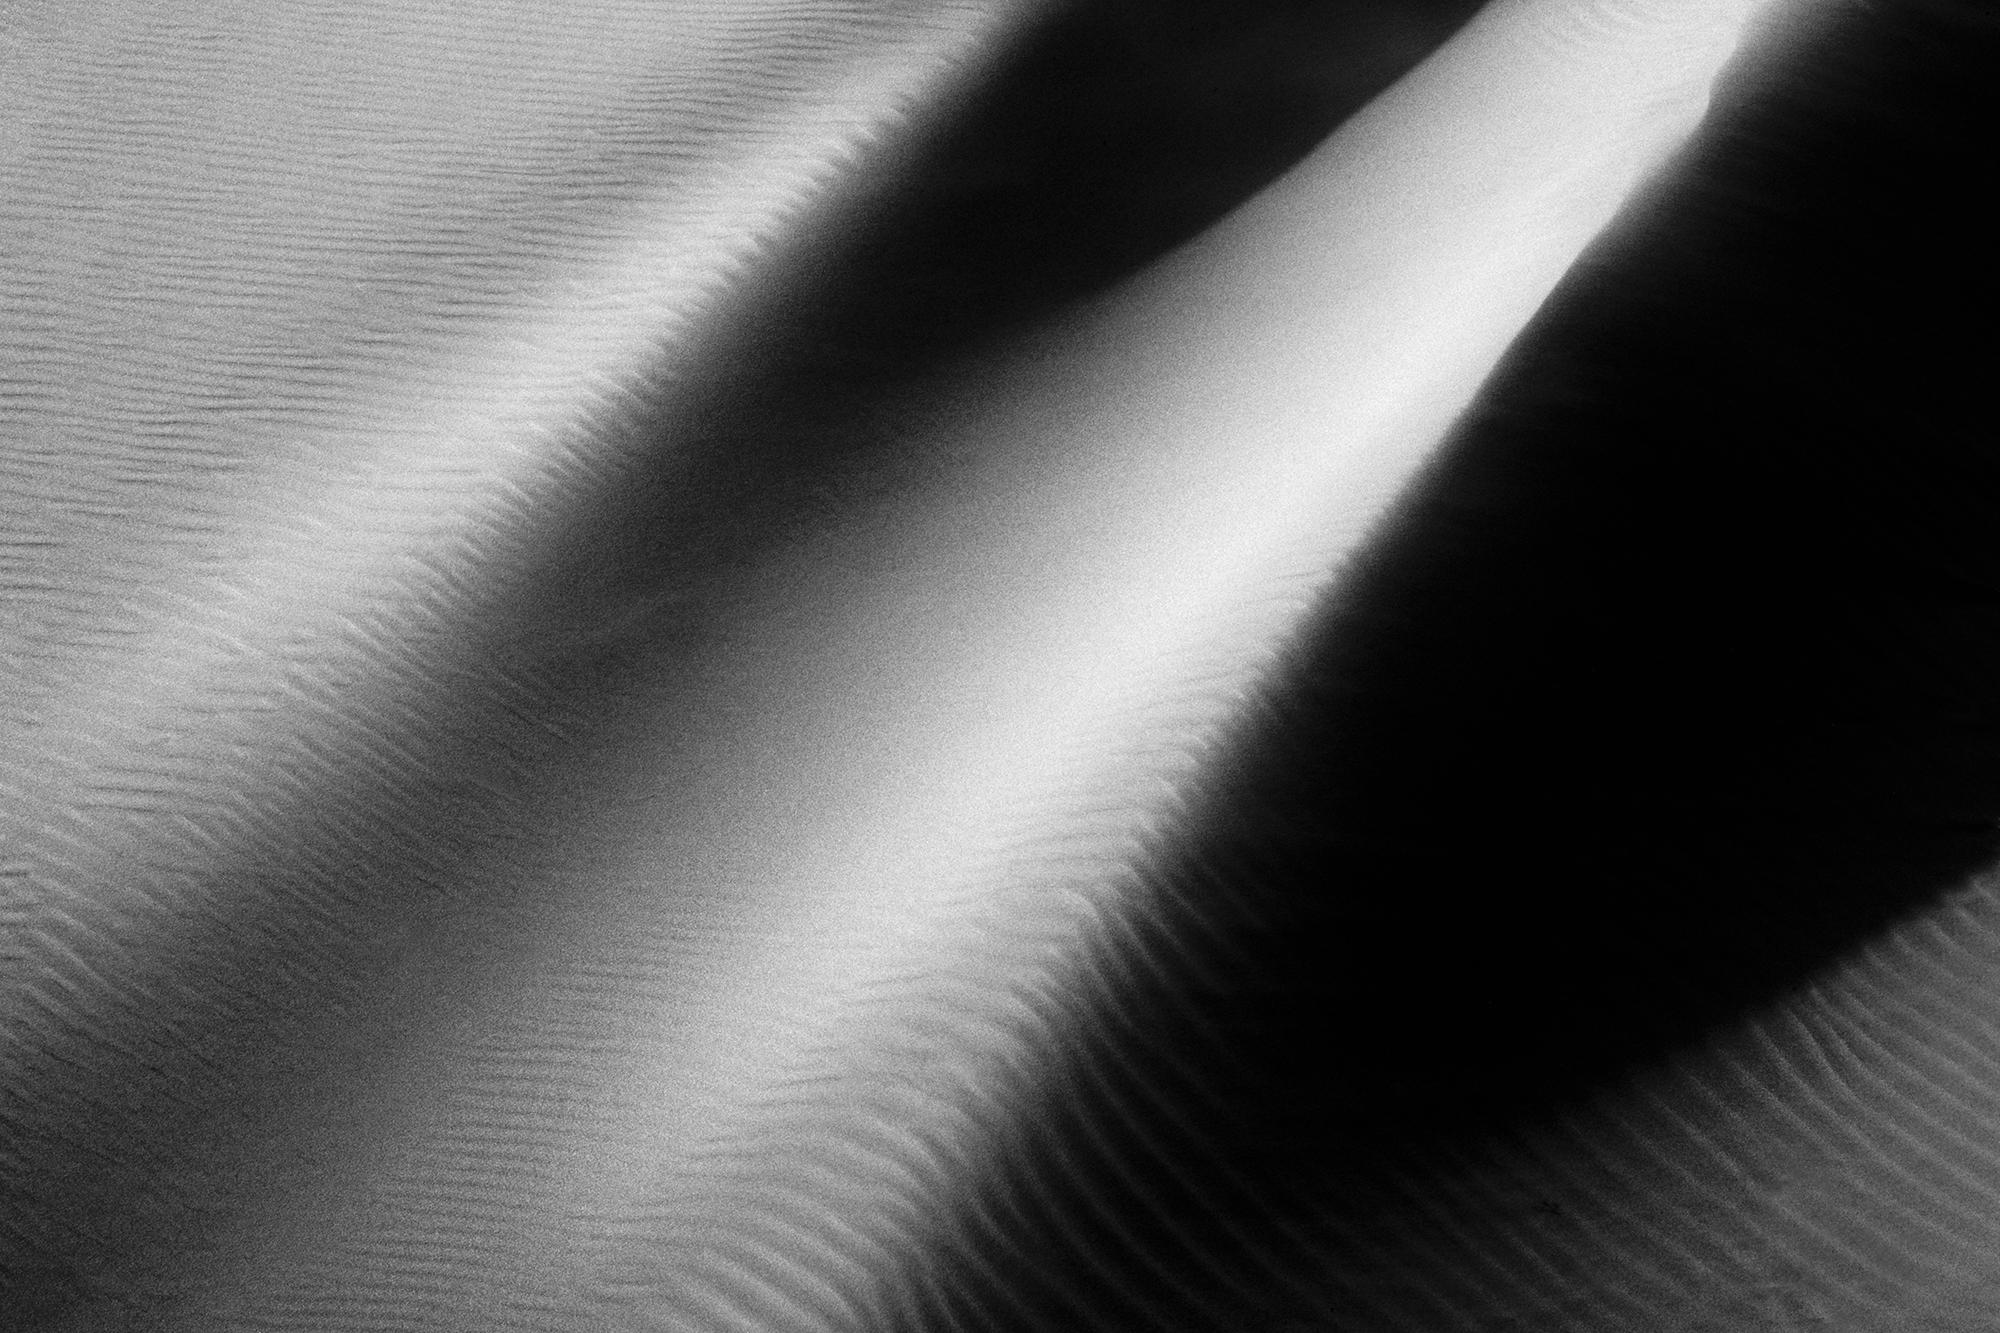 2011-9-10 Dune Detail No 39 - Final 2-3-2012 copy.jpg